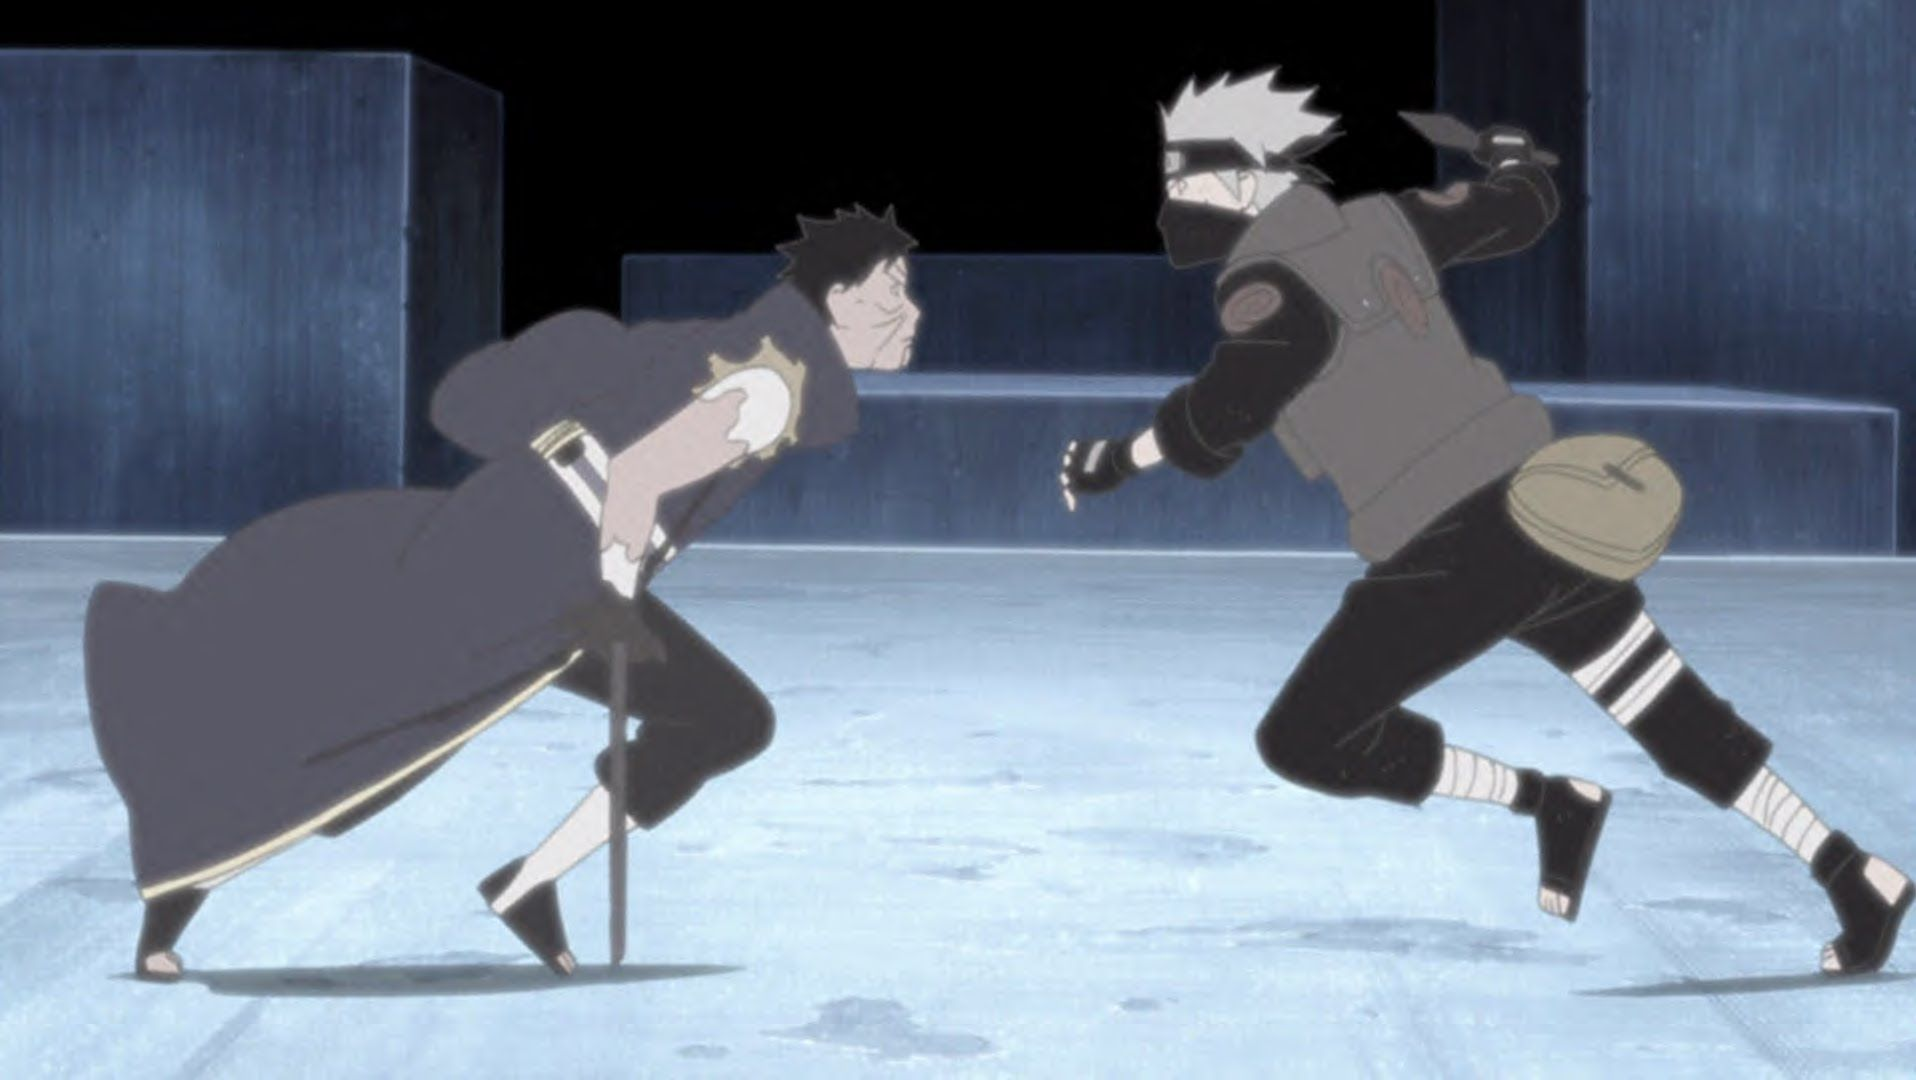 Kakashi fights Obito